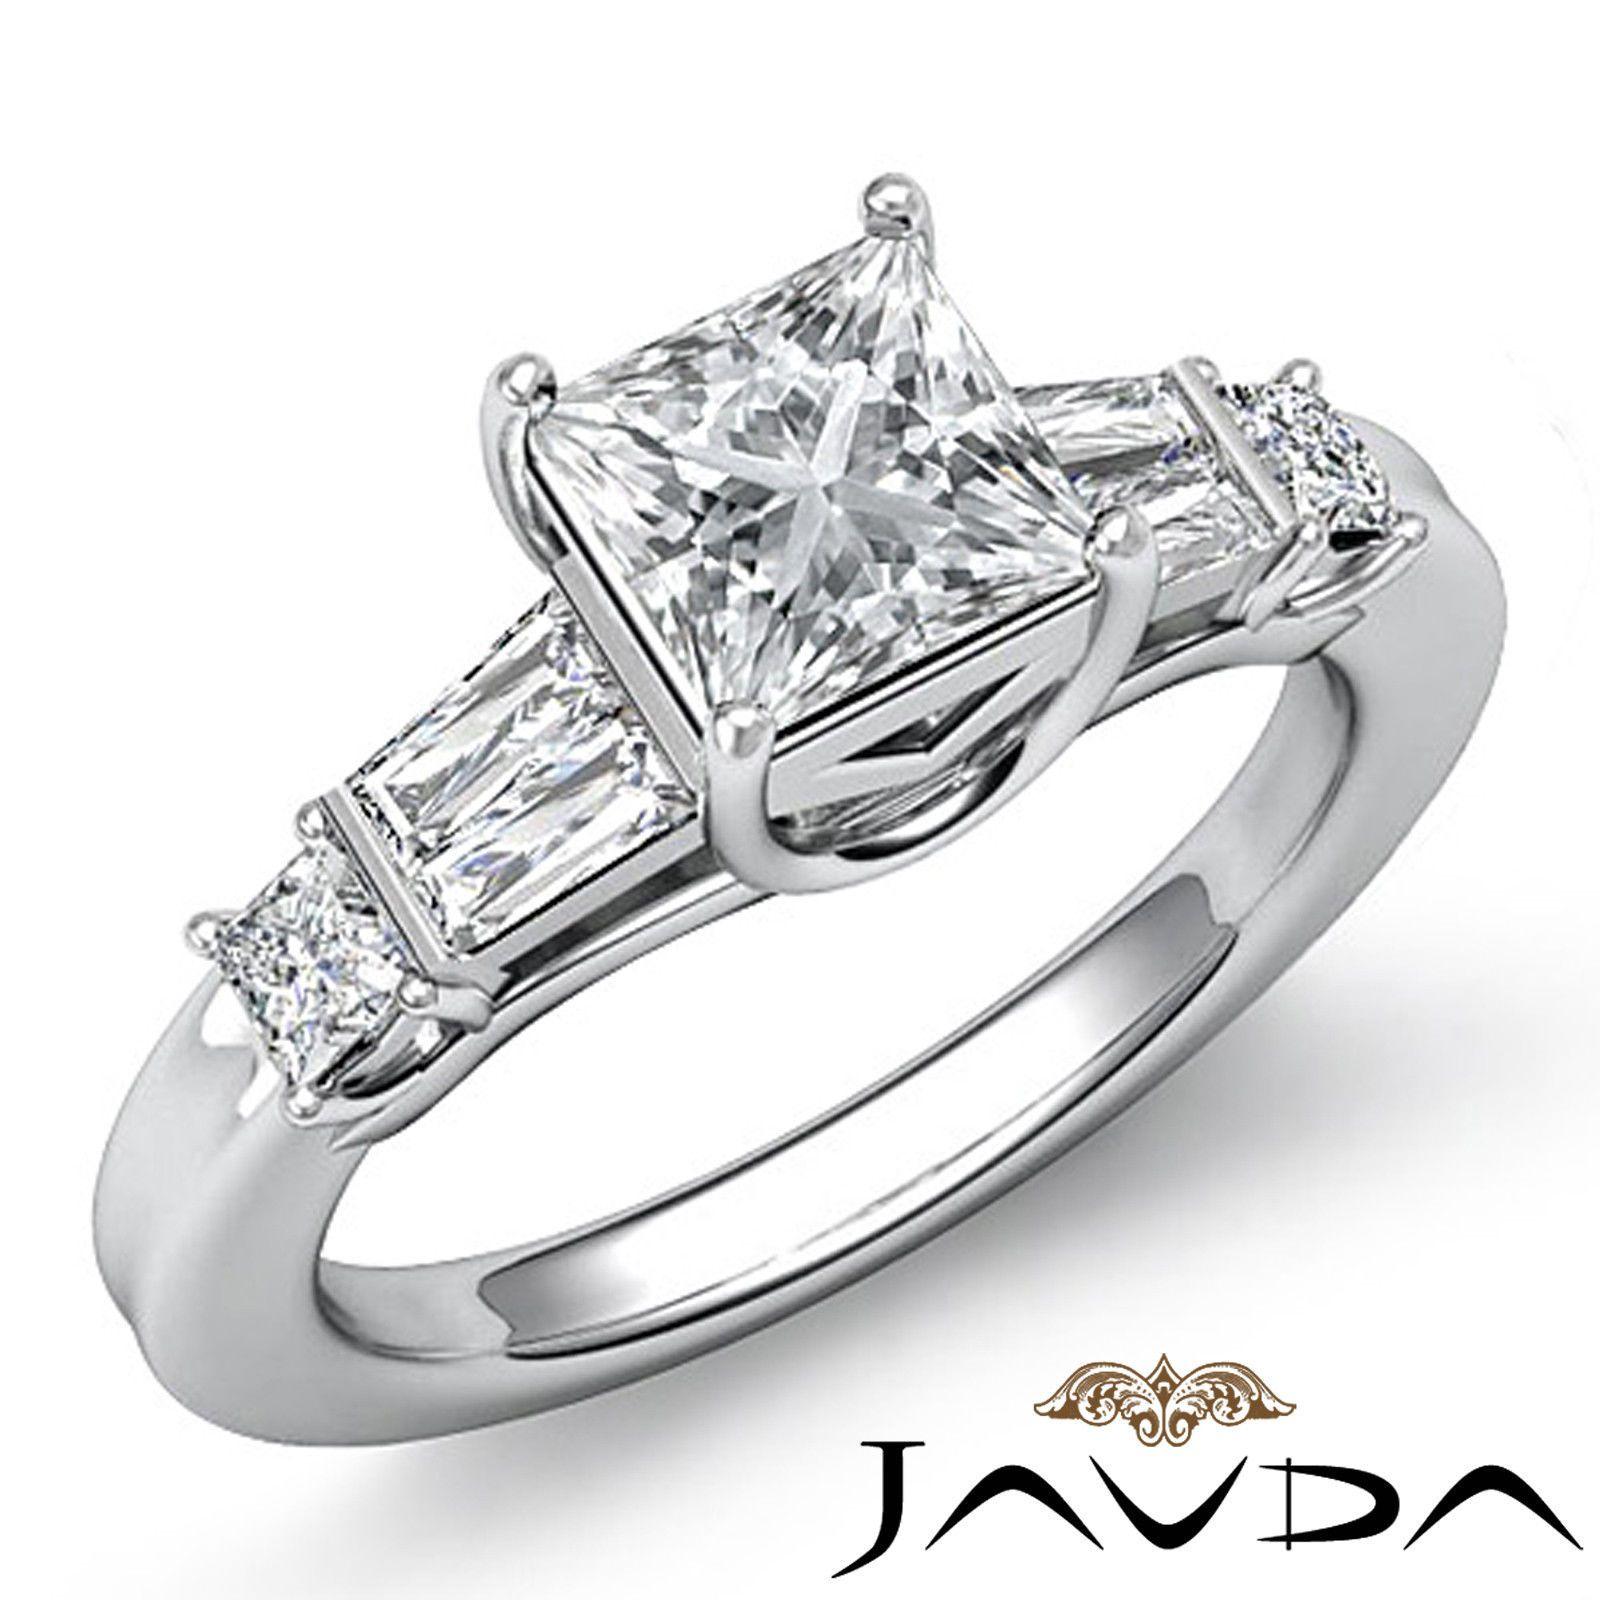 Princess Cut Three Stone Diamond Engagement Ring GIA I SI1 14k White Gold 1 45ct | eBay